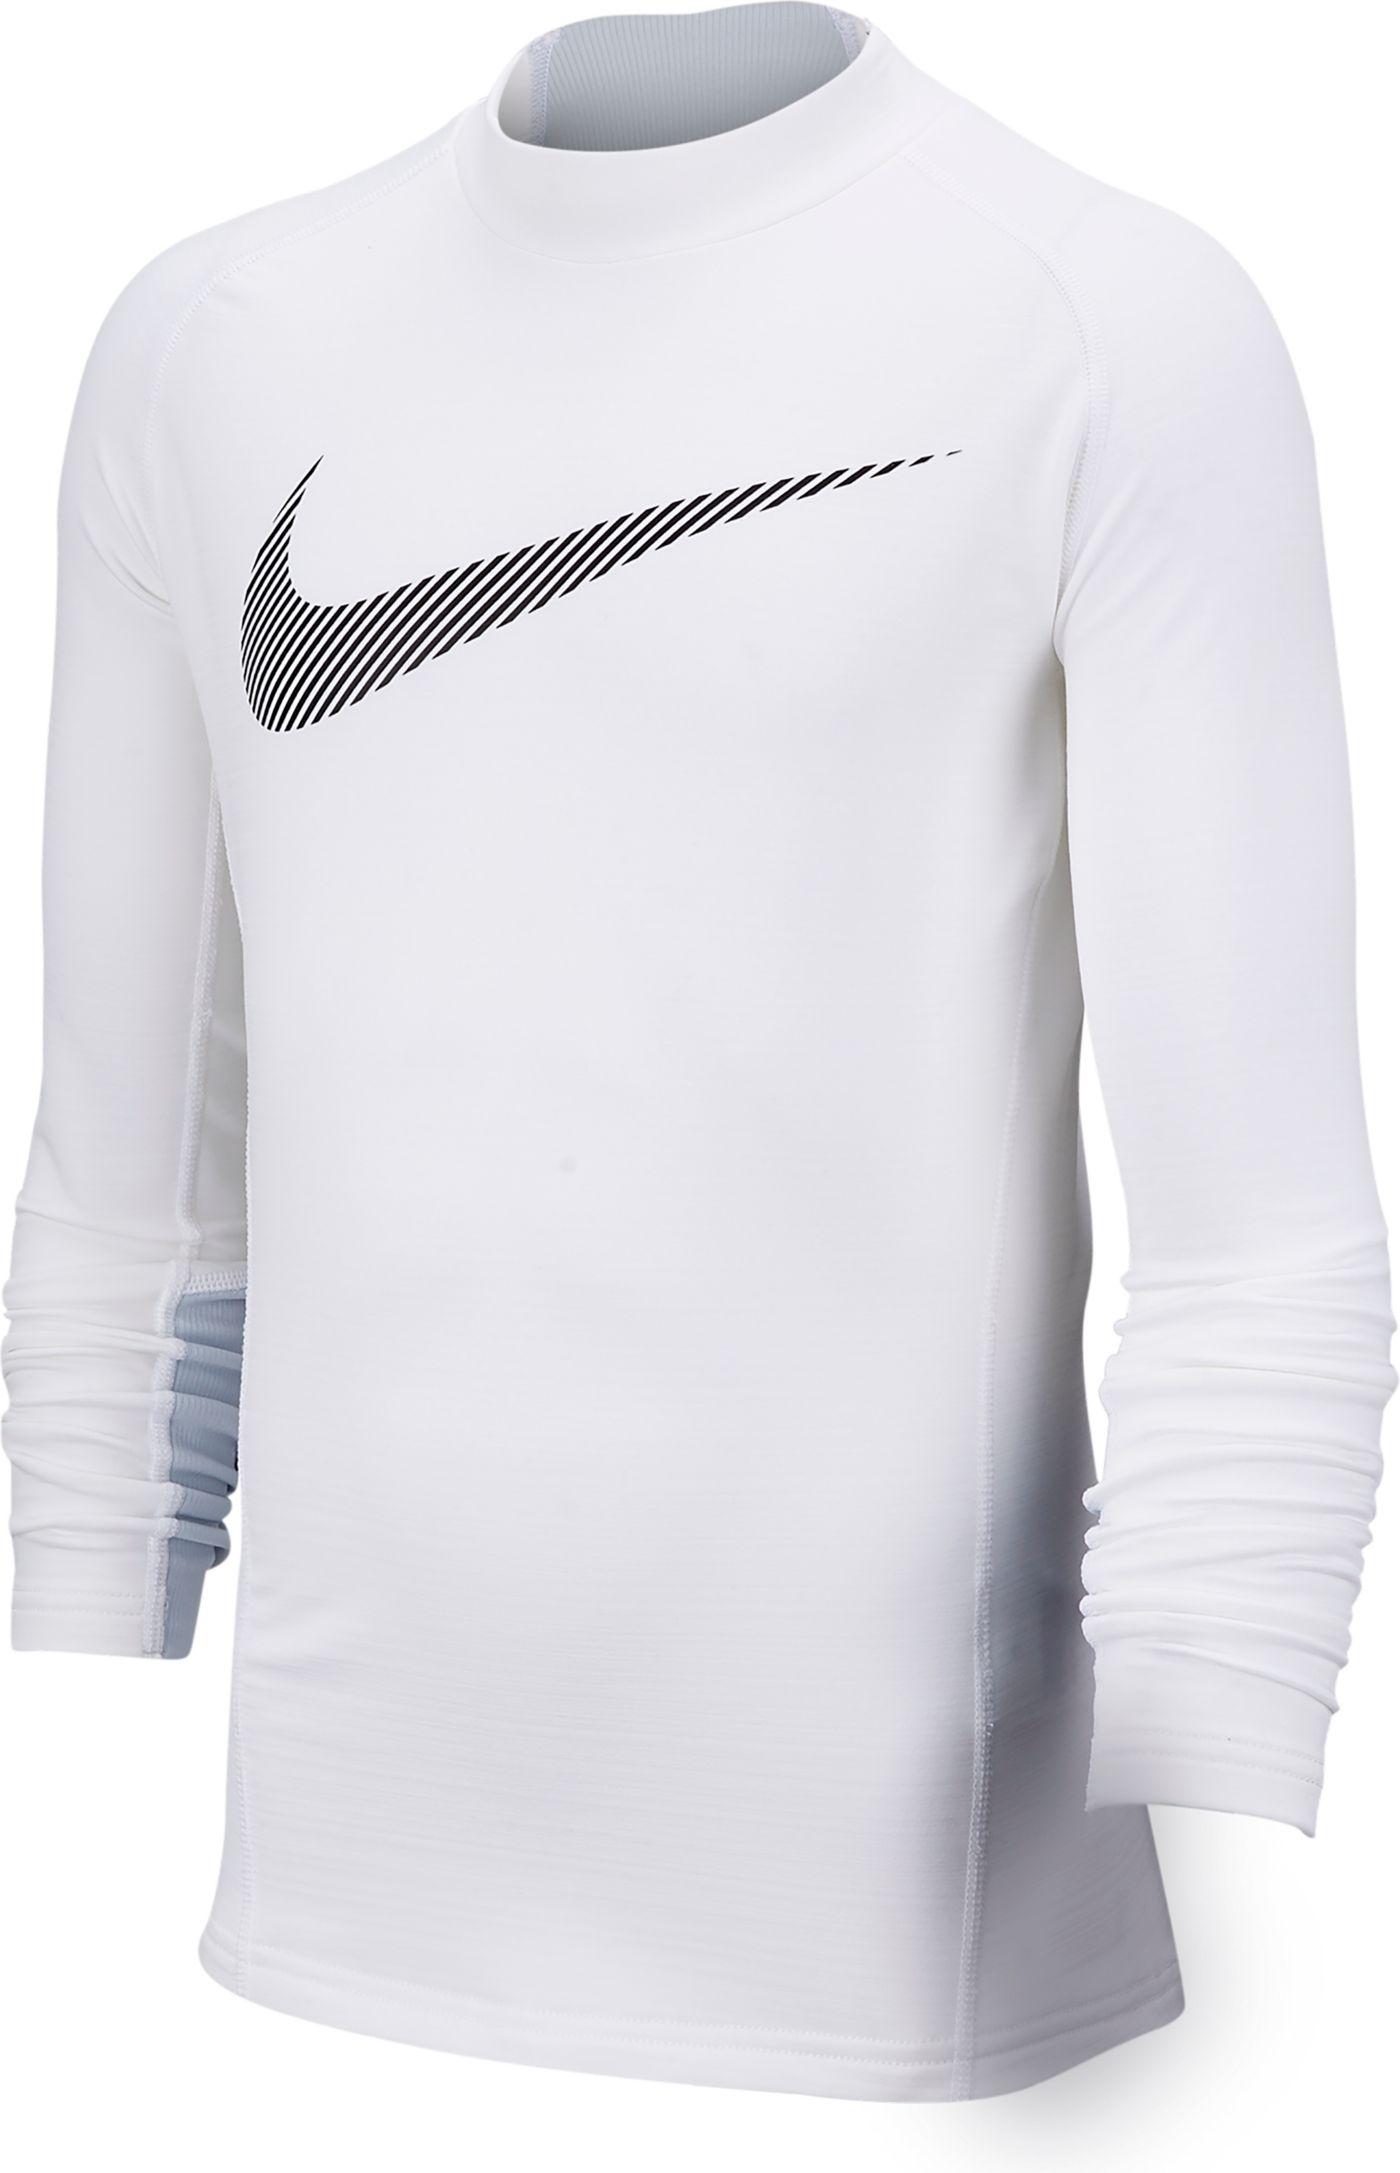 Nike Boys' Pro Warm Mock Neck Long Sleeve Shirt